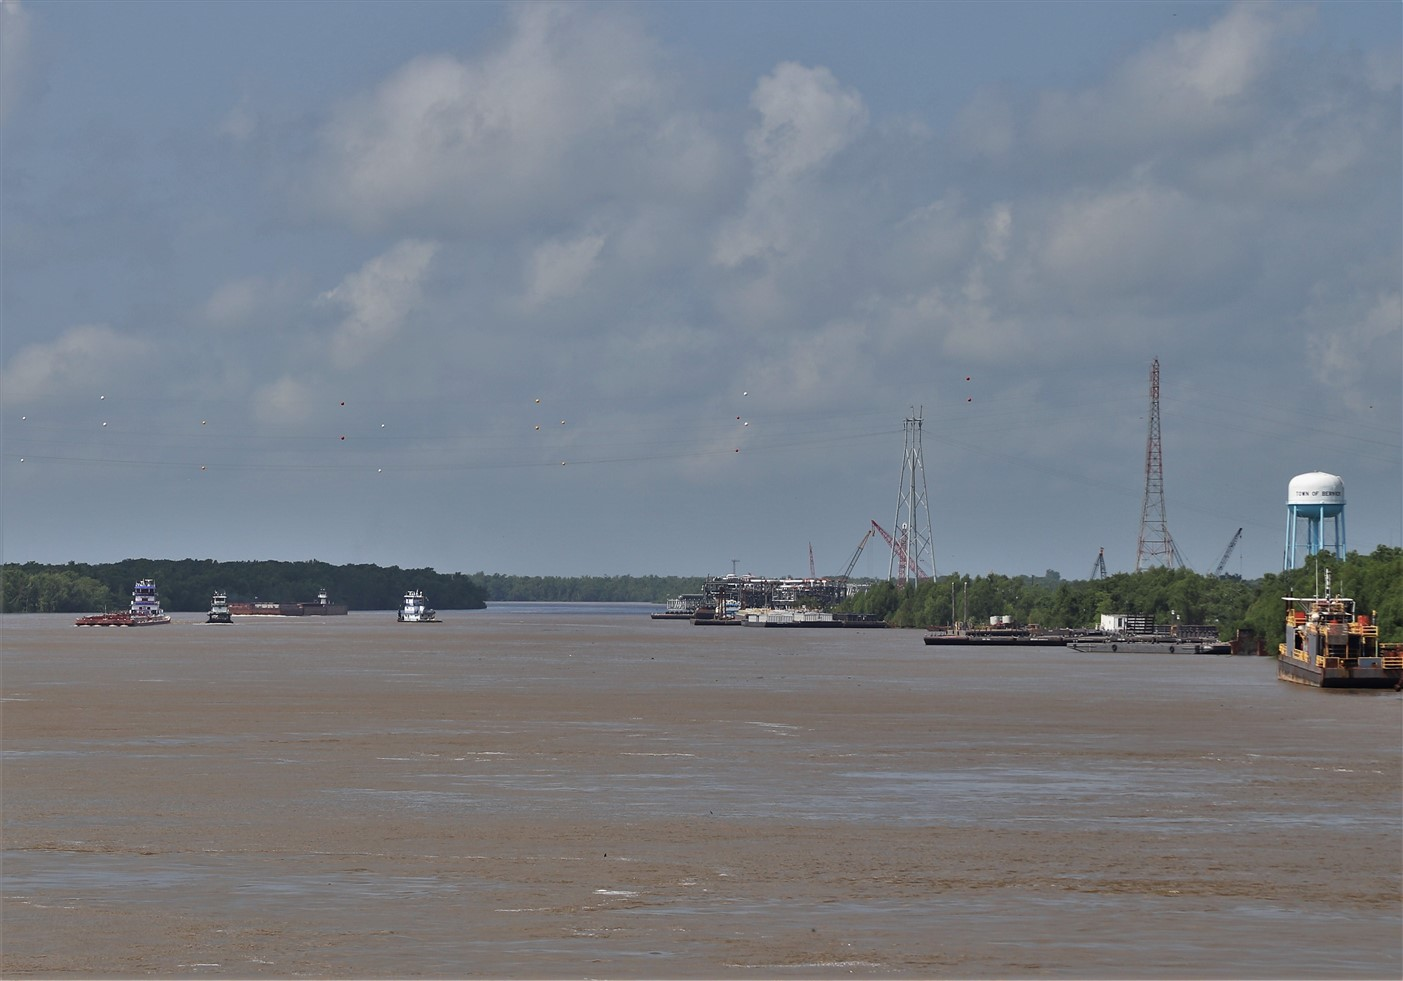 Morgan City, Louisiana – May 2019 – Offshore Oil Rig Museum